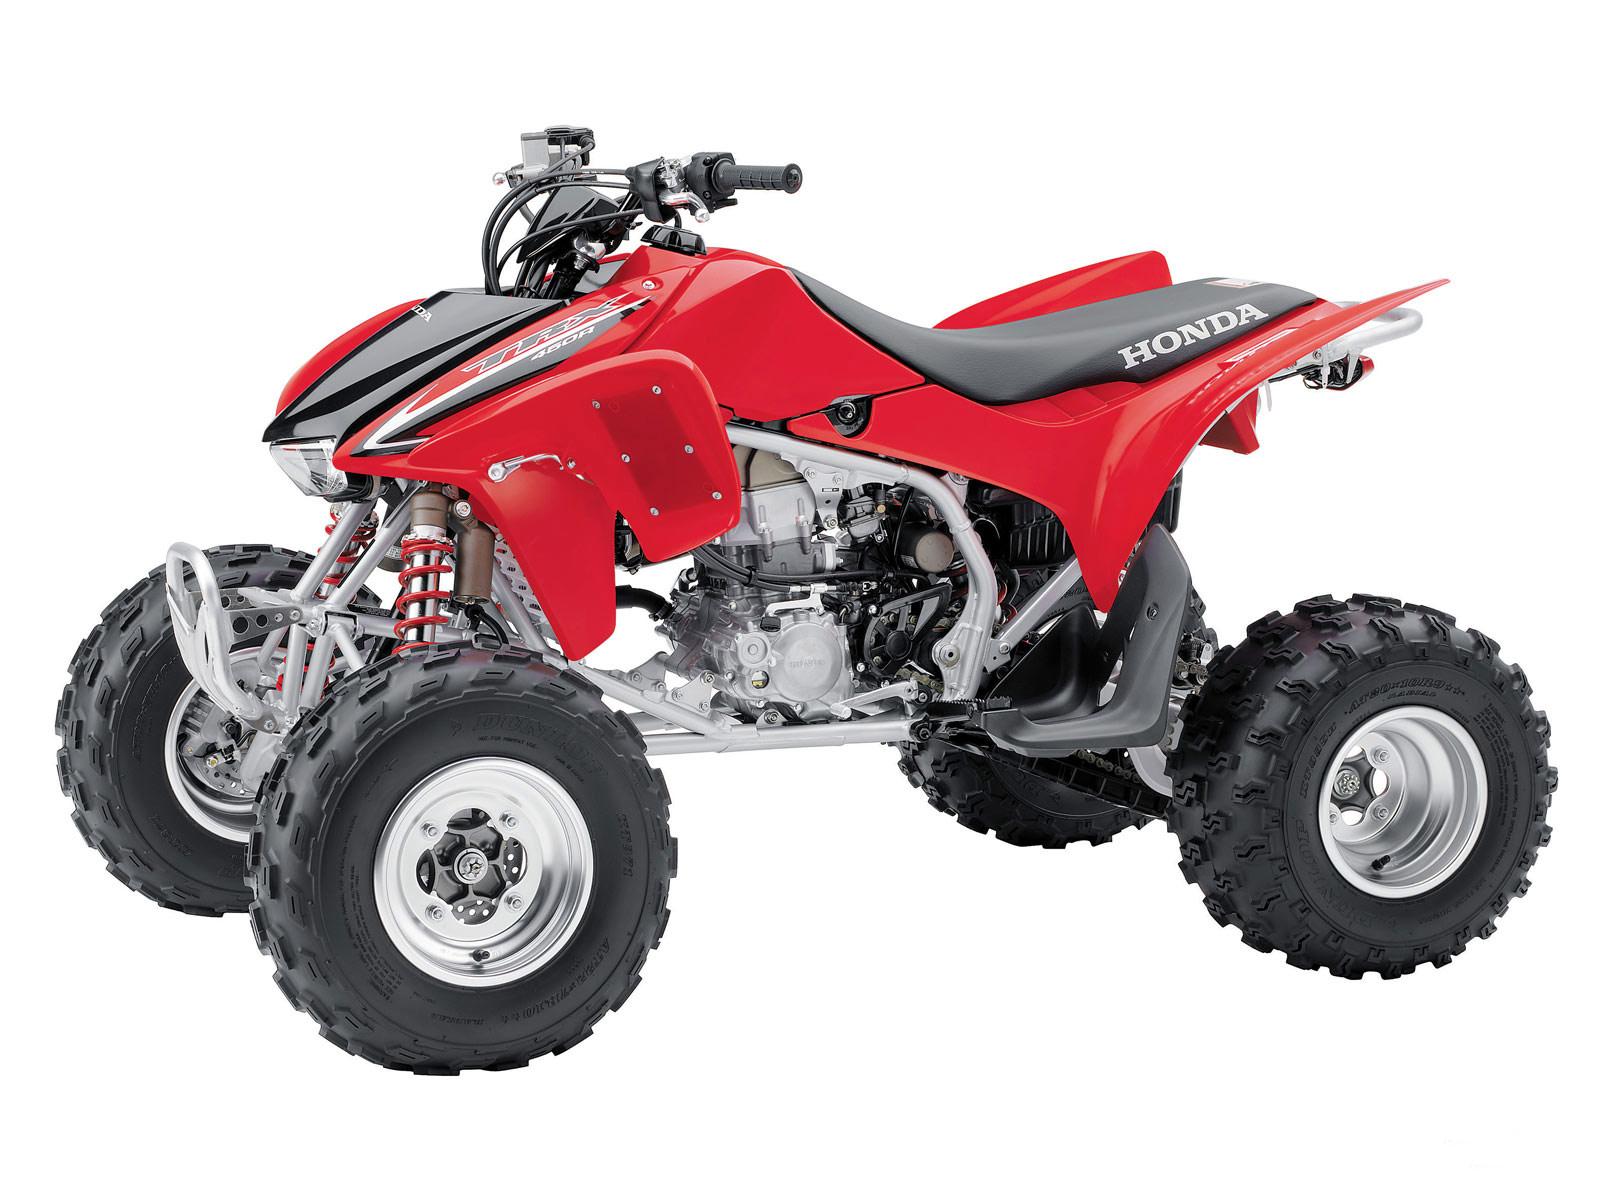 2008 HONDA TRX450R ATV pictures  specifications